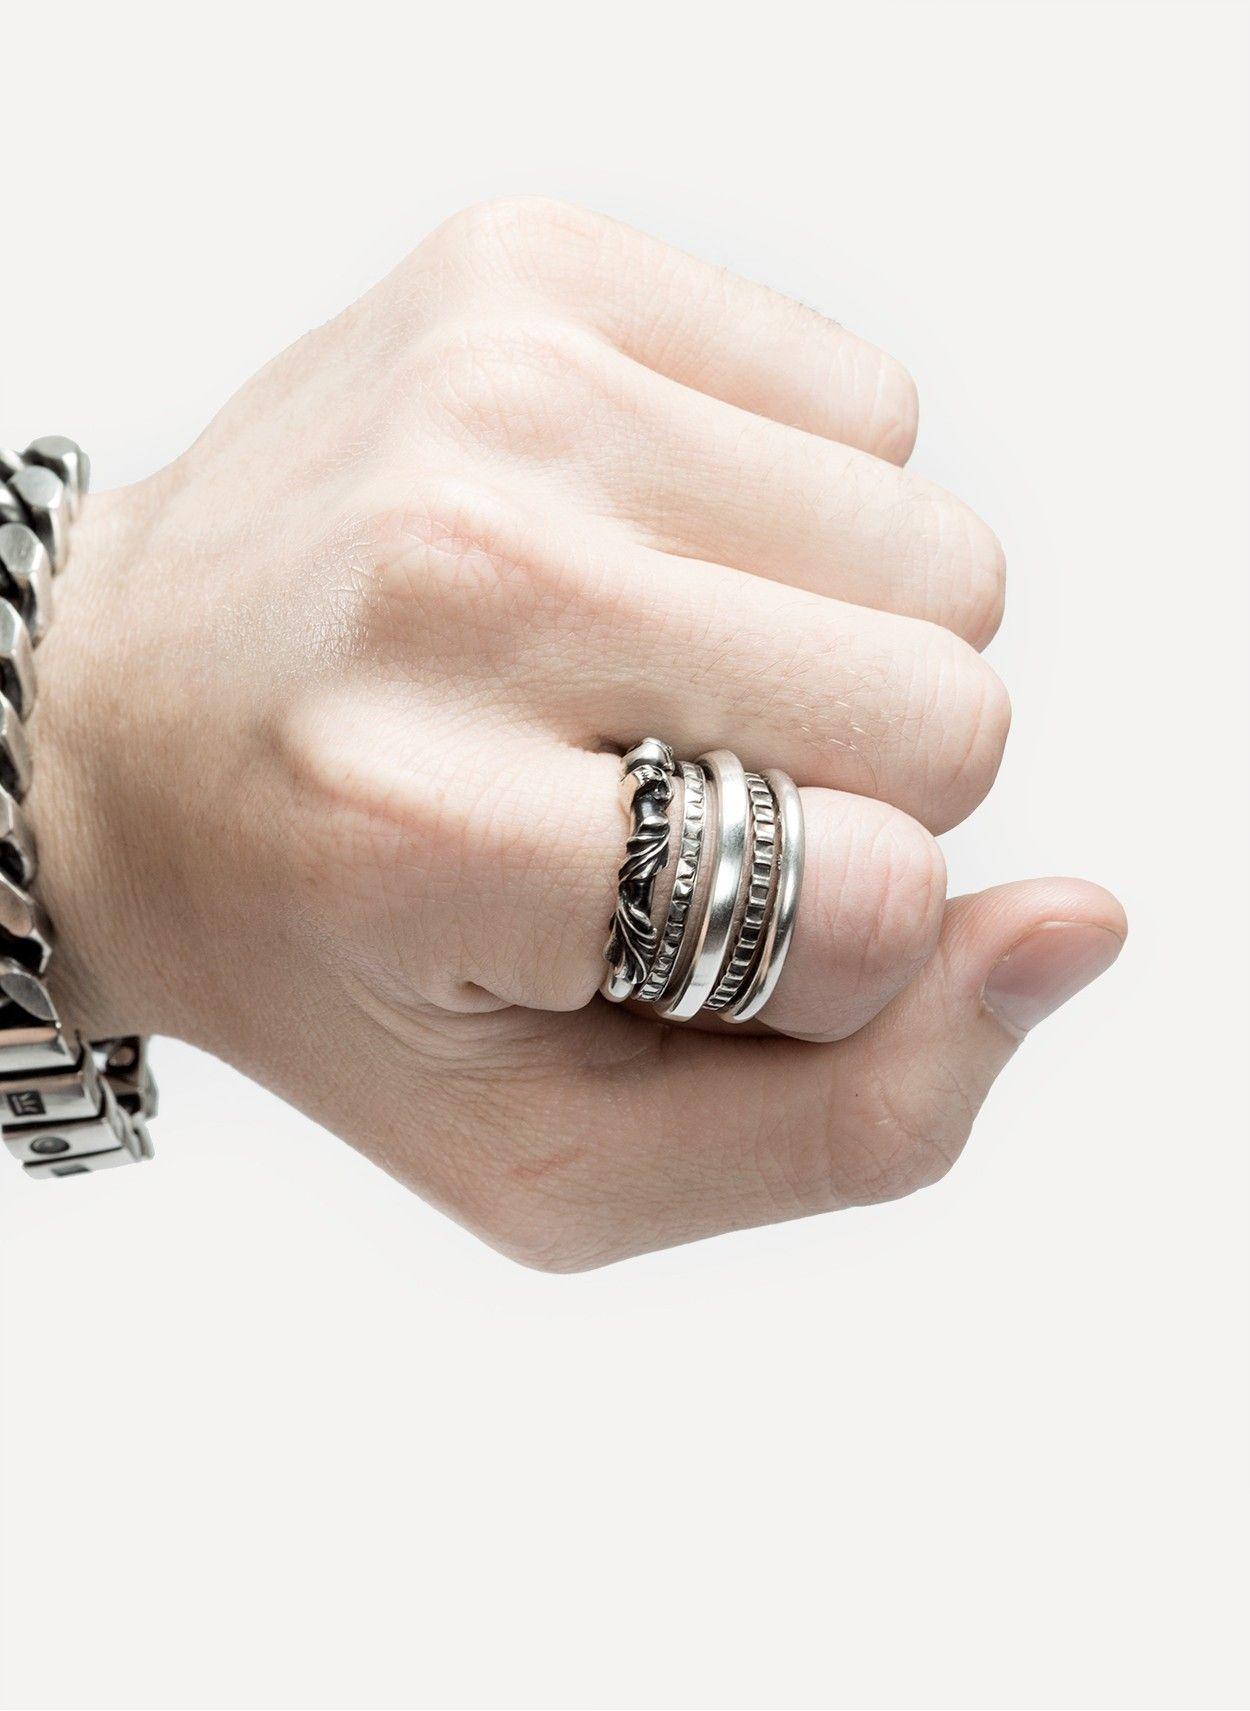 4cc013bbedc Werkstatt Munchen 13M118 5-Ring Combination Chrome Hearts